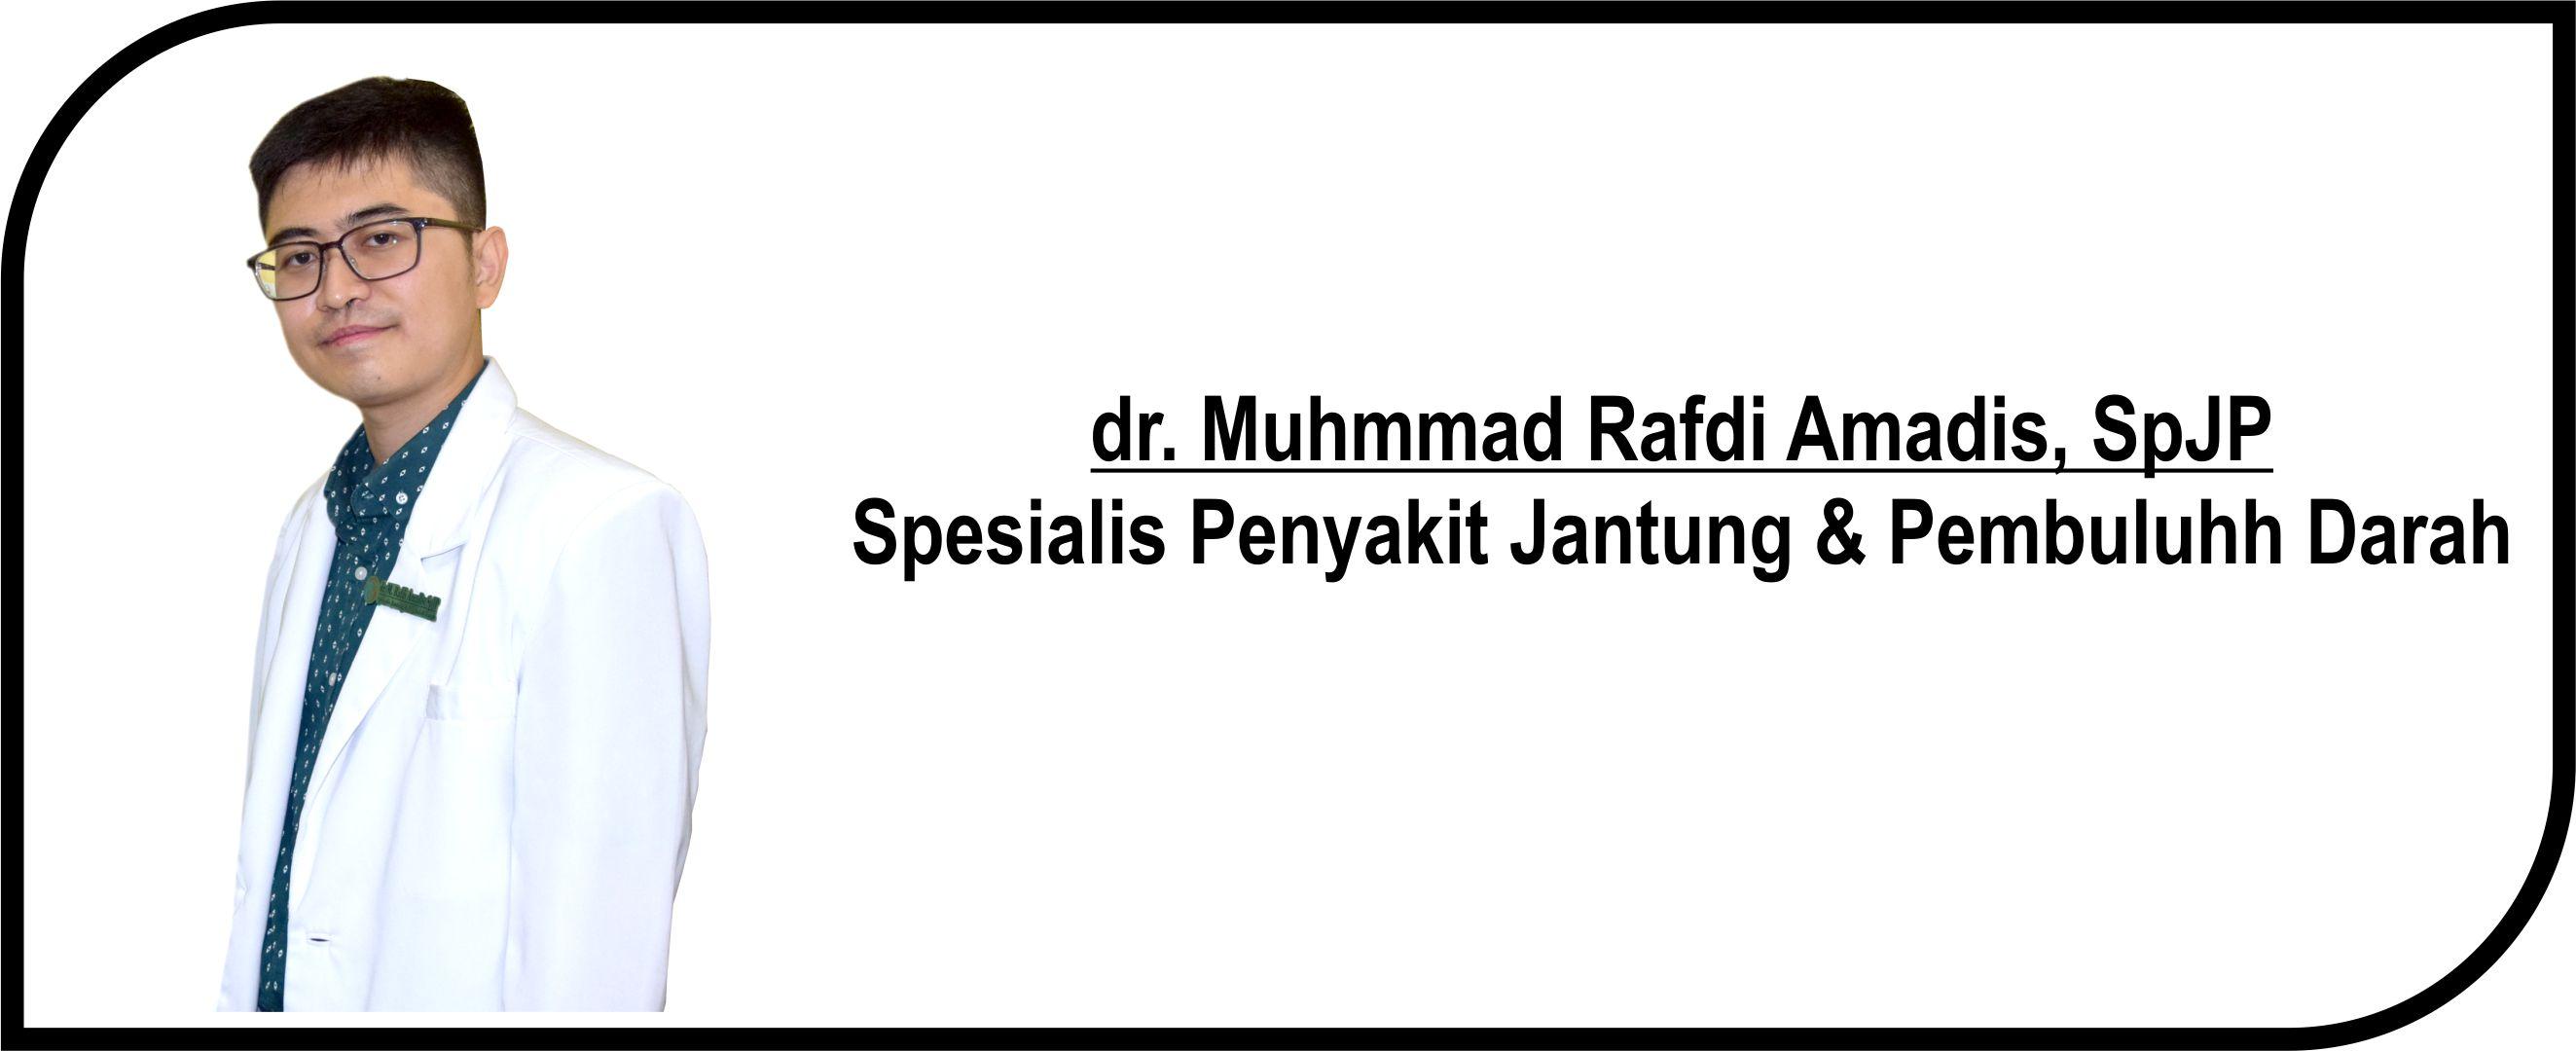 <p>Dokter Spesialis Jantung & Pembuluh Darah</p>  <p>Melayani :</p>  <p>1. Pasien Rawat Inap</p>  <p>2. Pasien Rawat Jalan</p>  <p>Jadwal Praktik Poli :</p>  <p>Senin, Rabu dan Jum'at : 14.00 - 16.00 WIB</p>